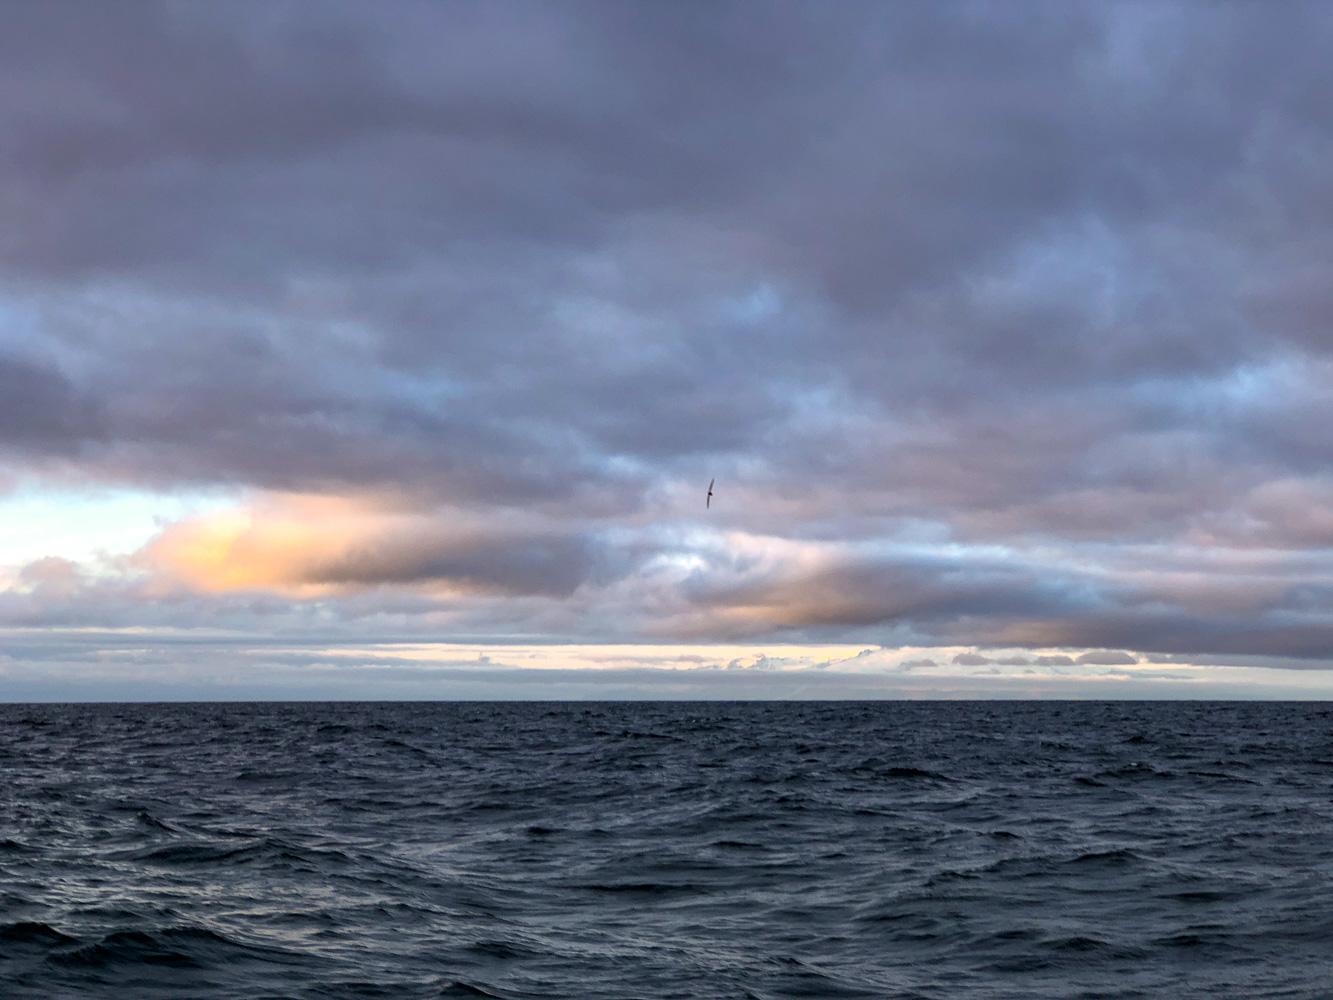 Sunset off Iceland